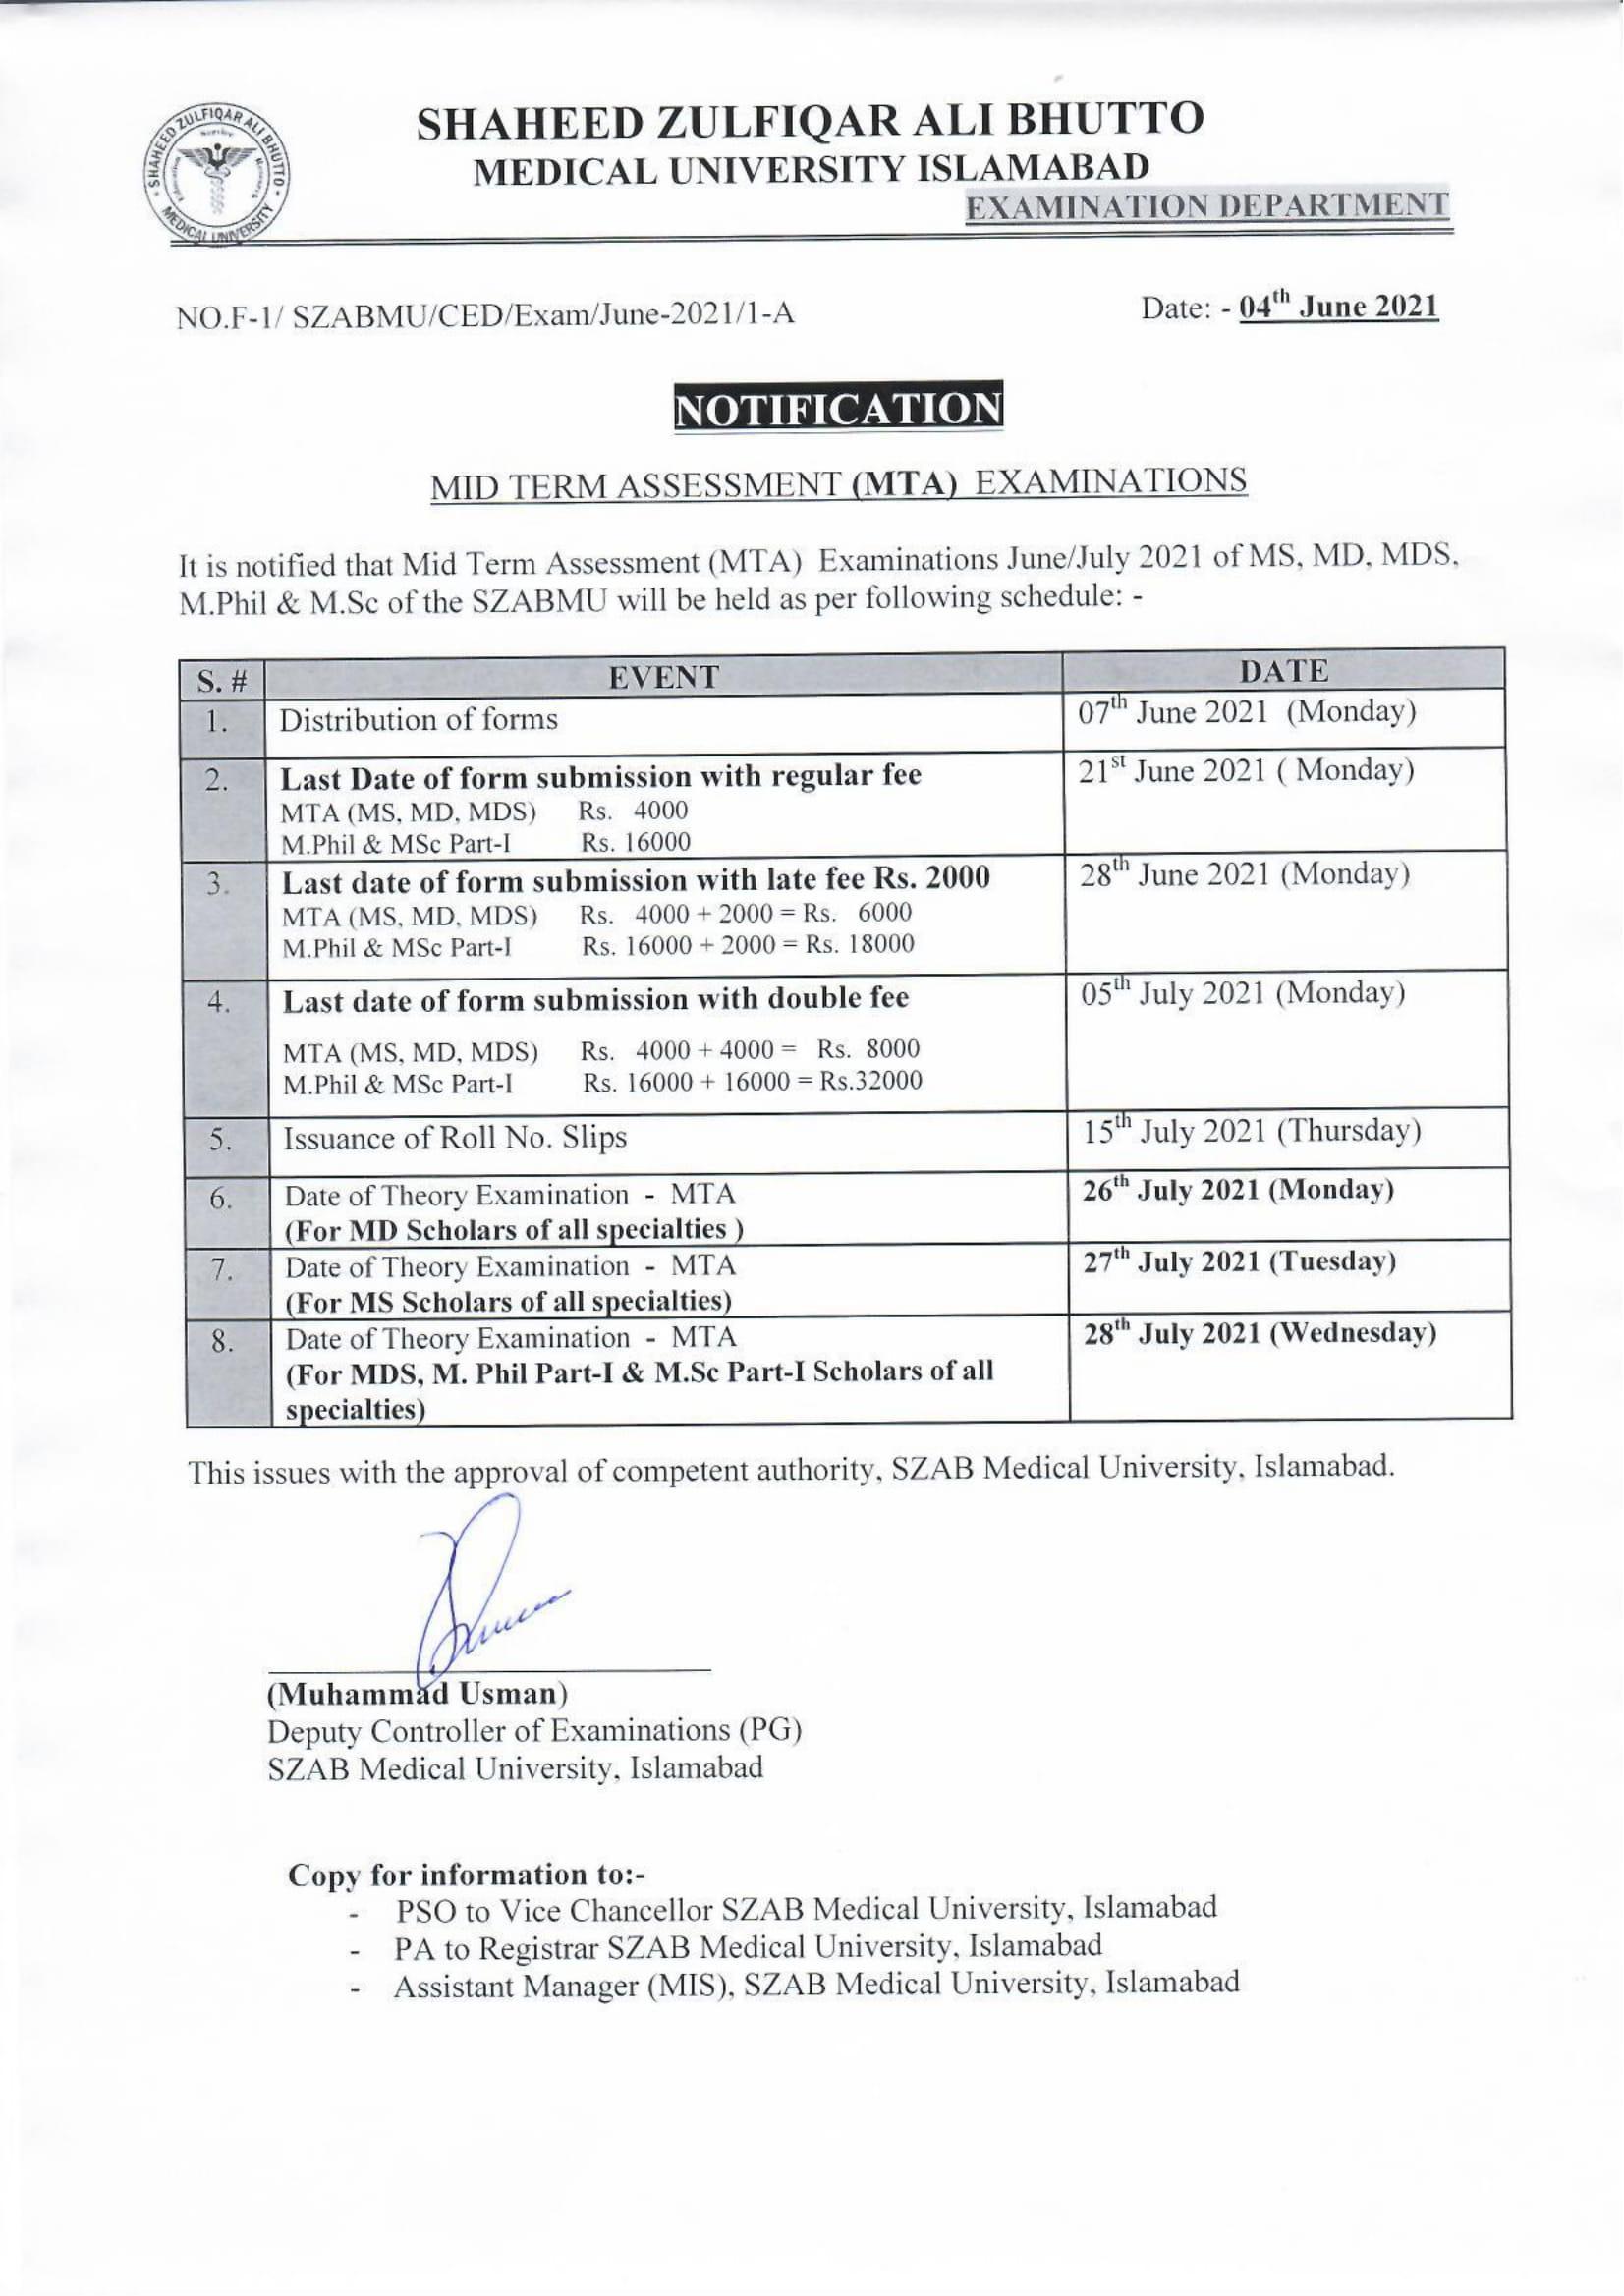 Notification of MTA Examination of SZABMU June / July 2021